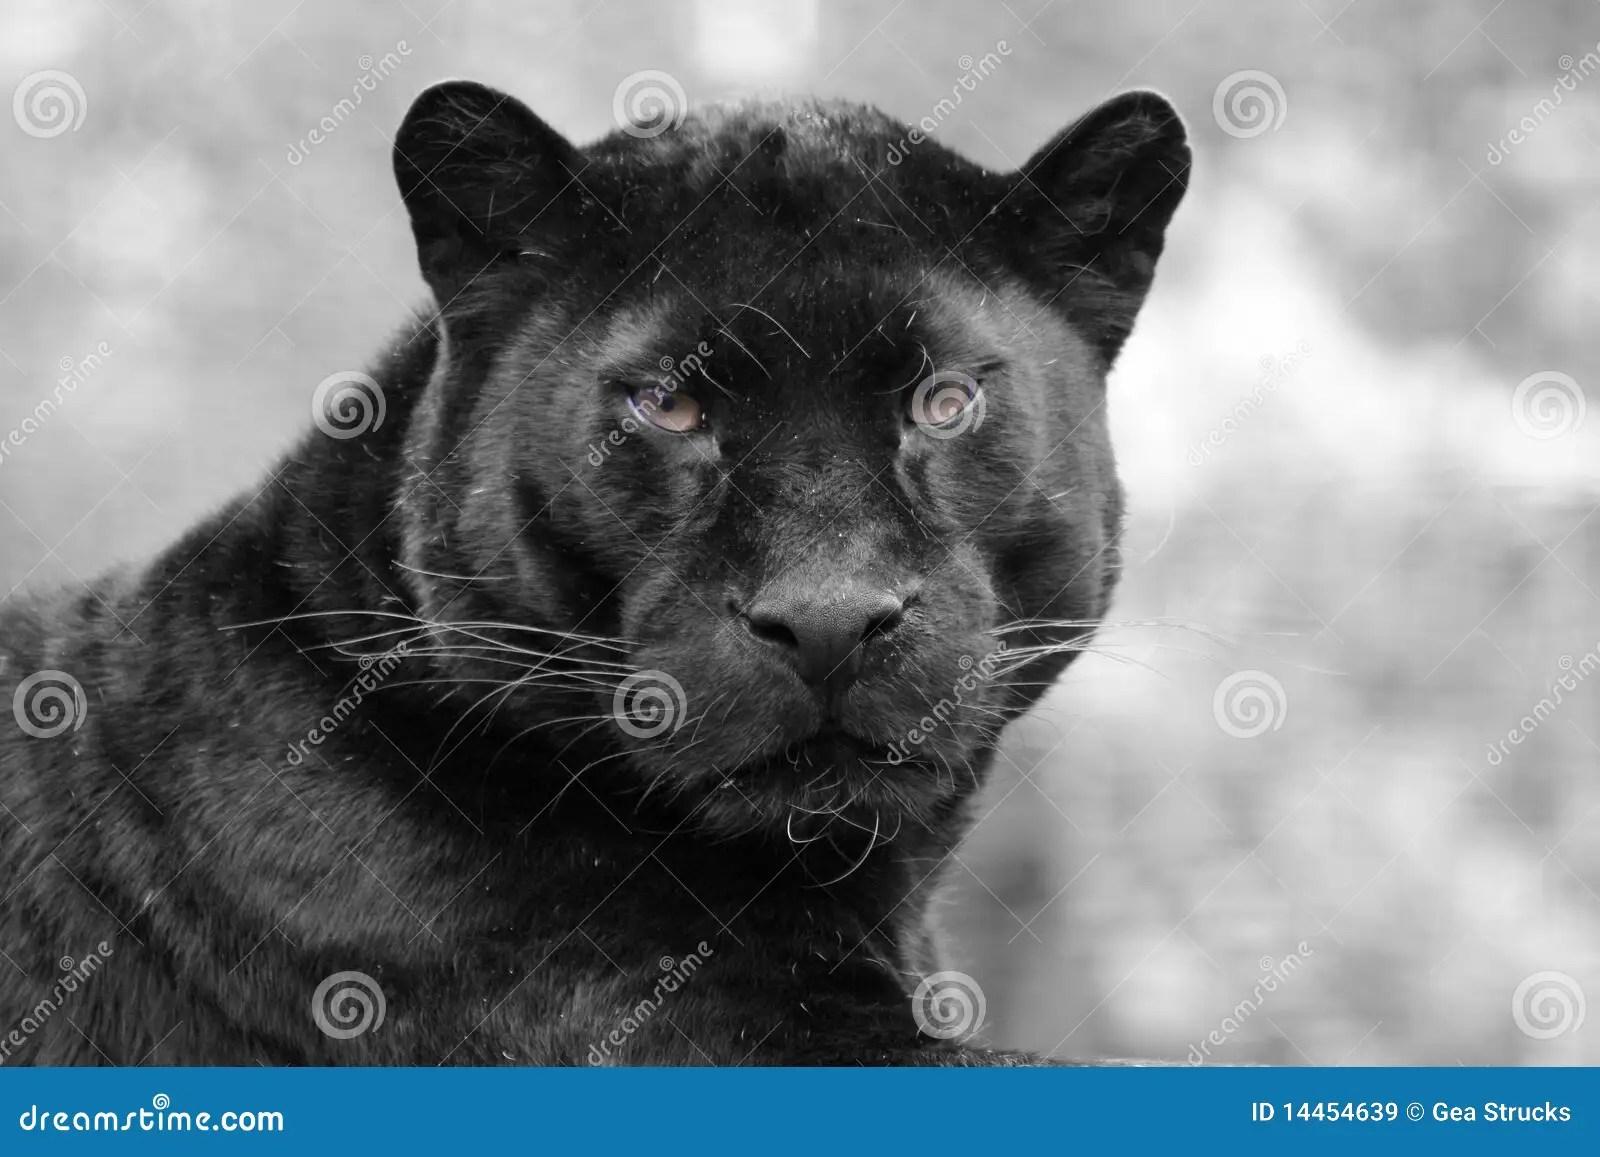 Leopard Animal Print Wallpaper Black Panther Royalty Free Stock Images Image 14454639